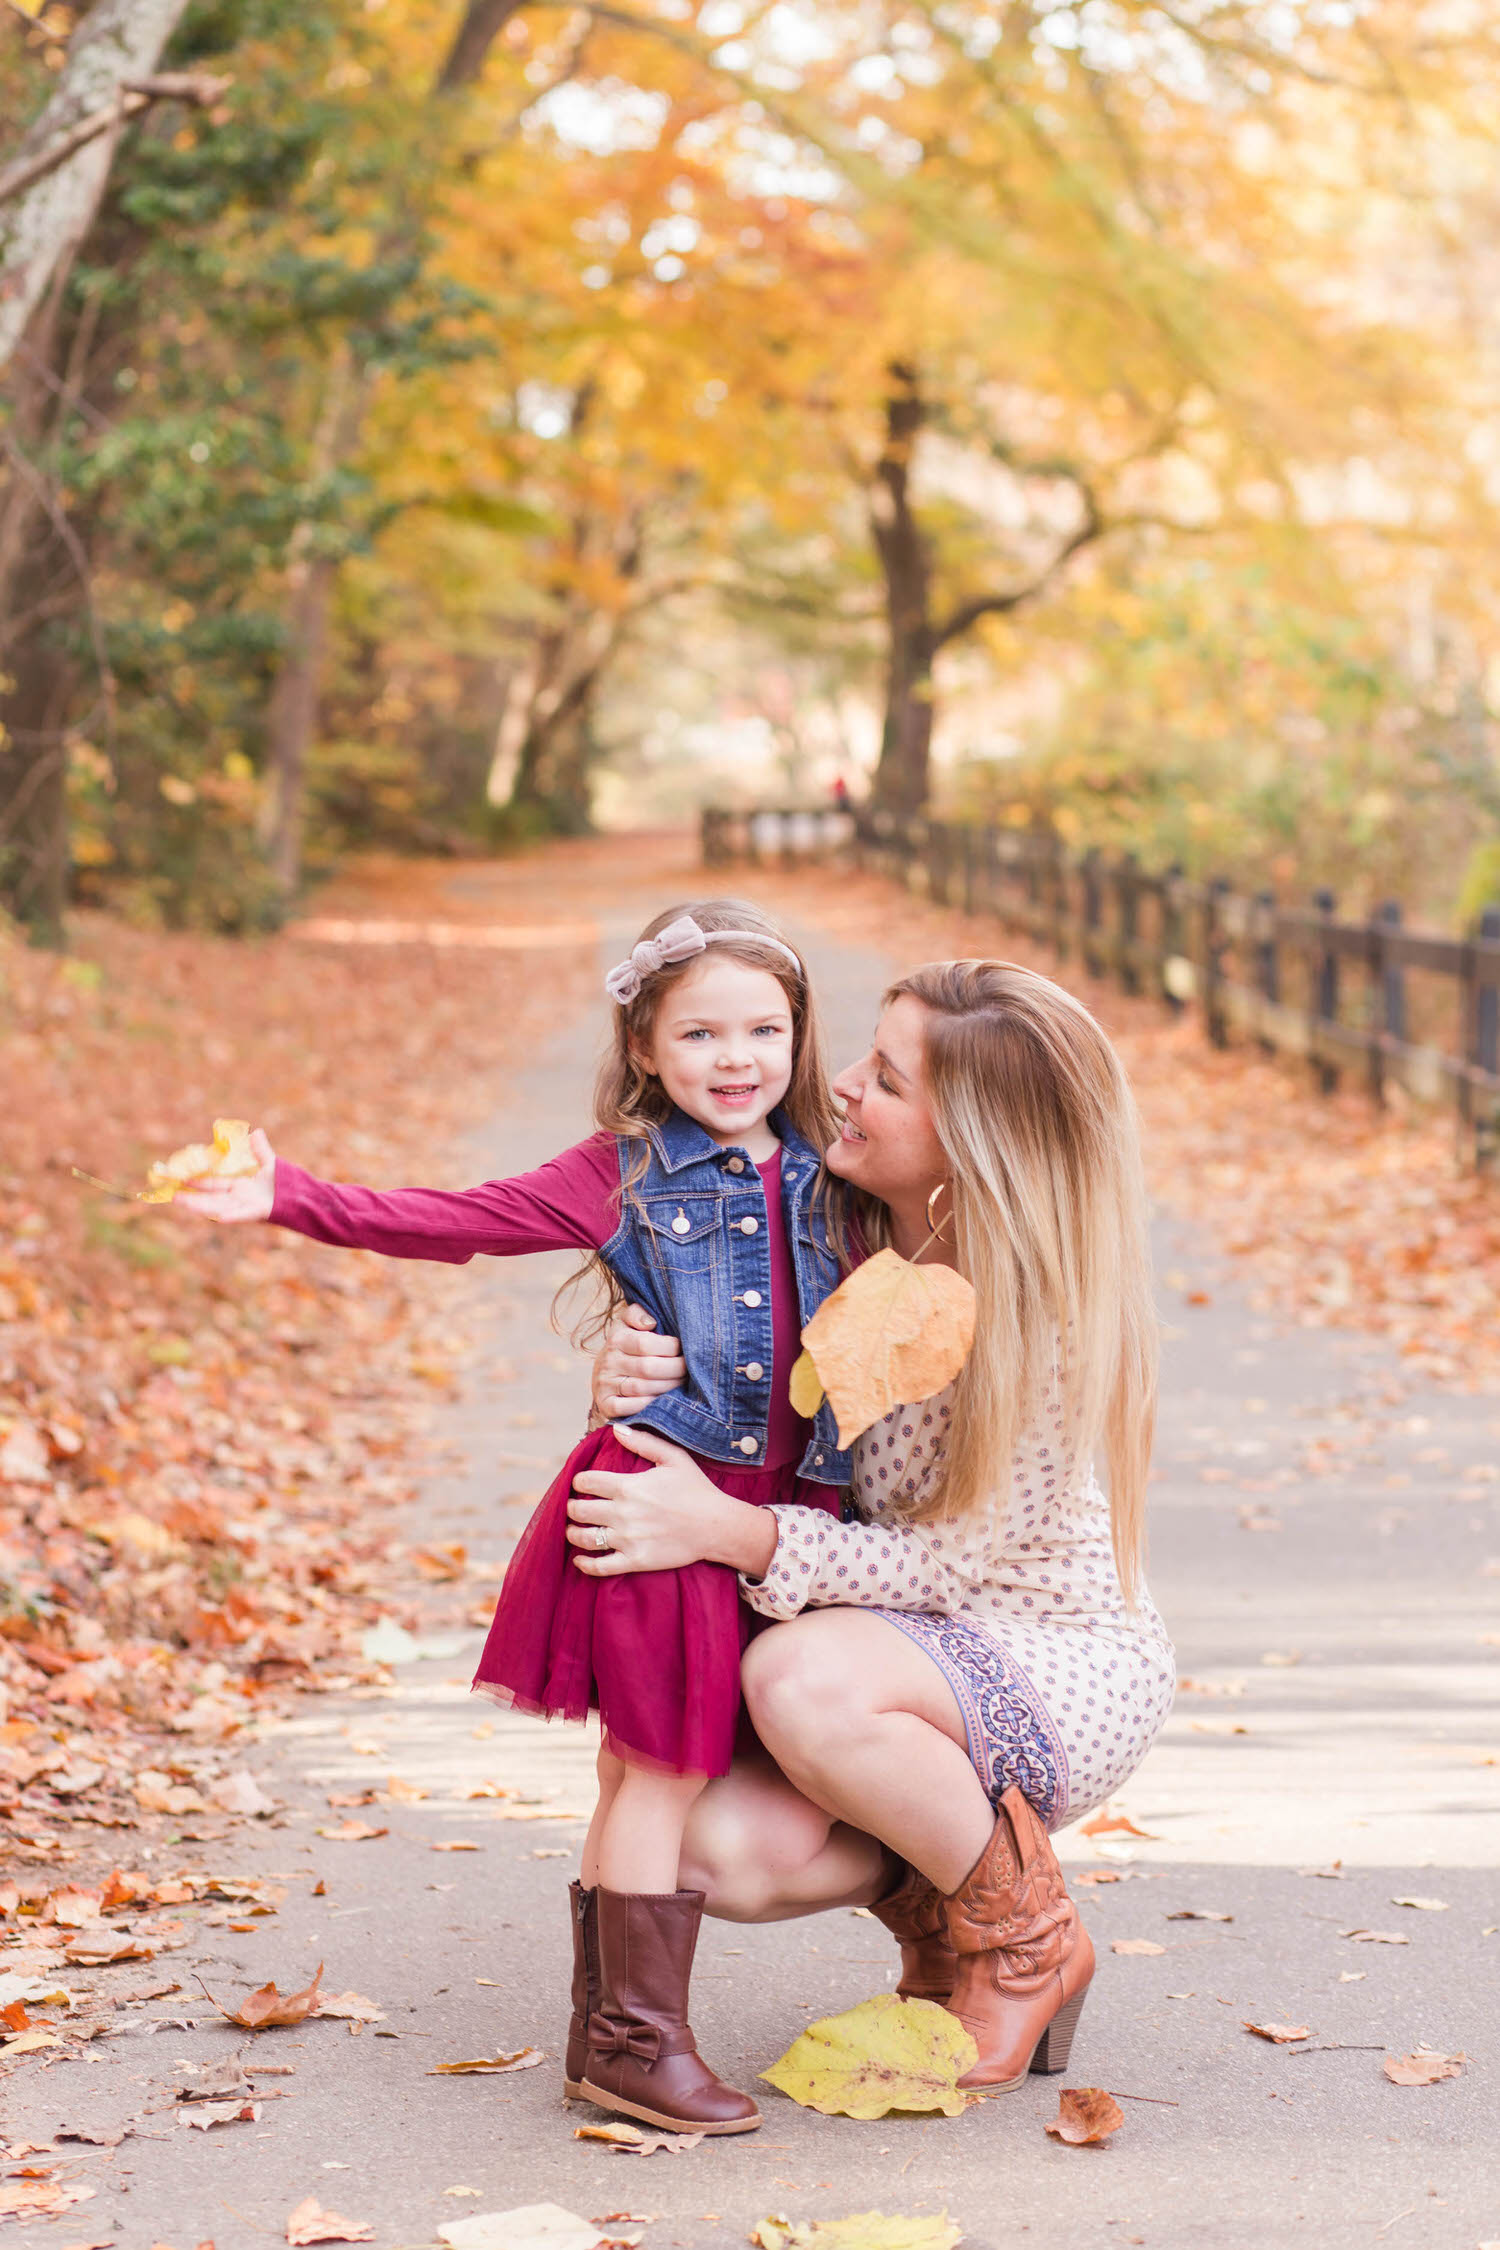 Ashley-AMBER-Photo-Greenville-Family-Photographer-161125.jpg